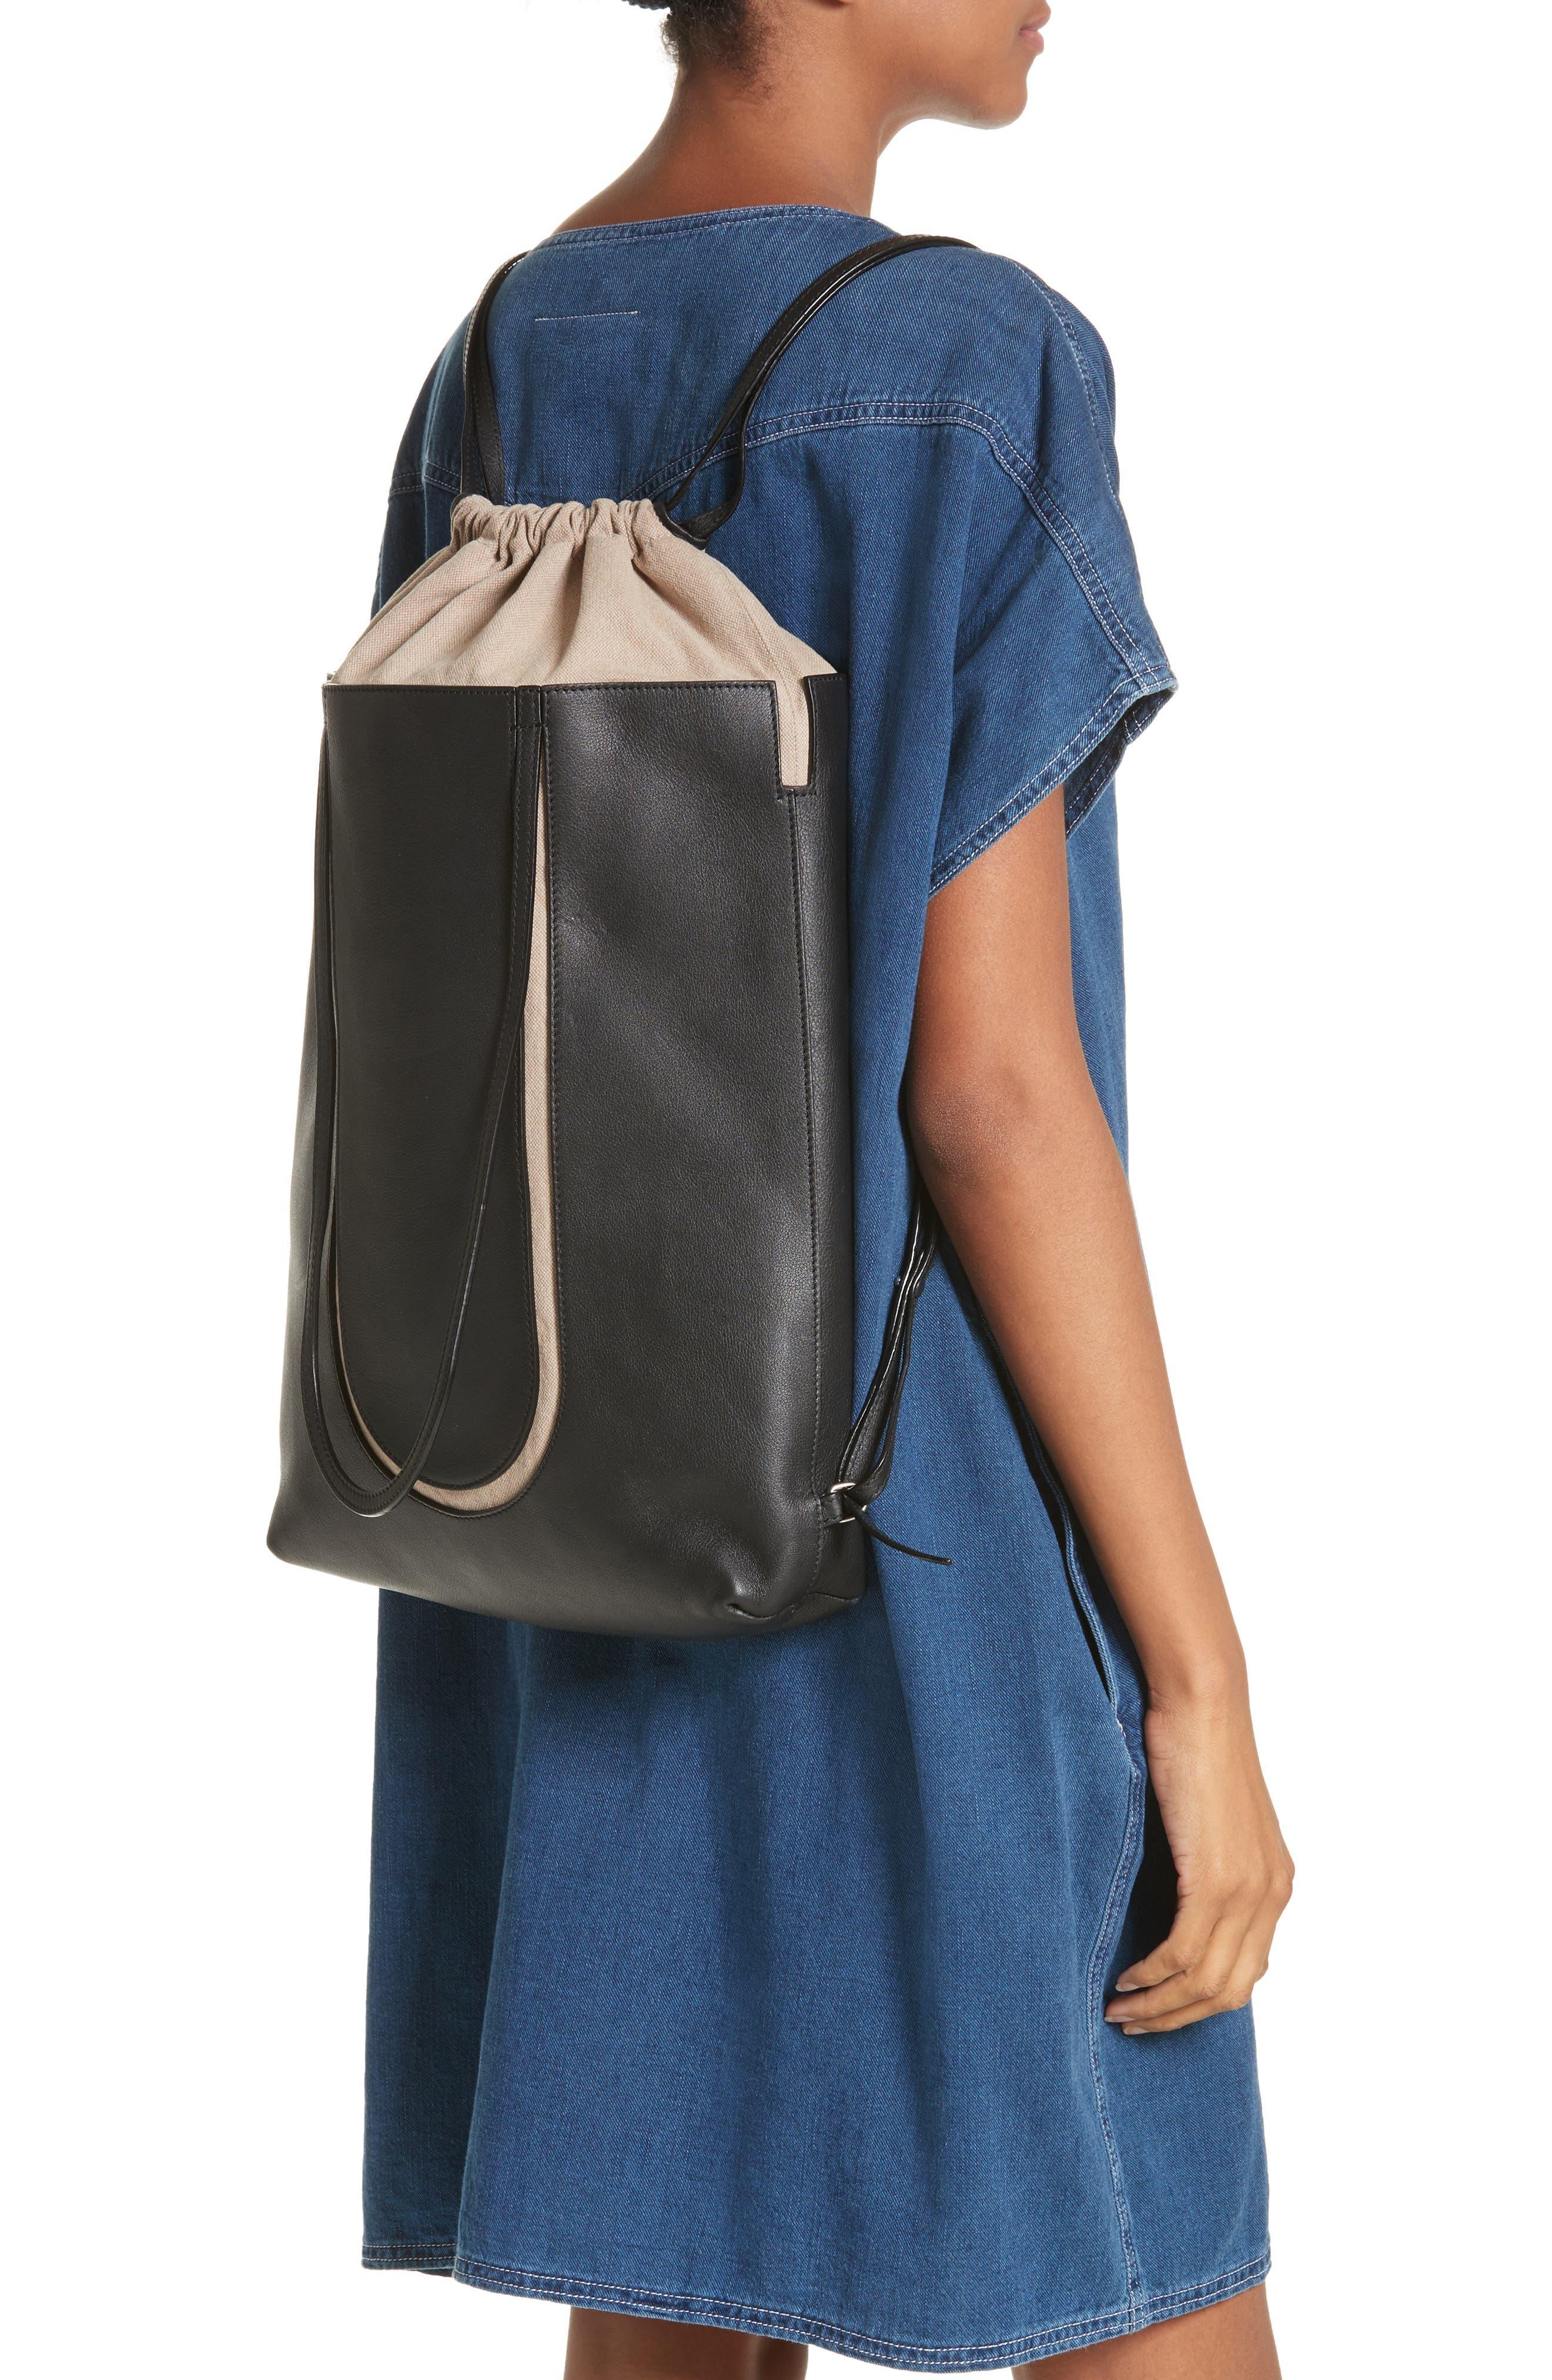 Calfskin Leather Backpack,                             Alternate thumbnail 2, color,                             001